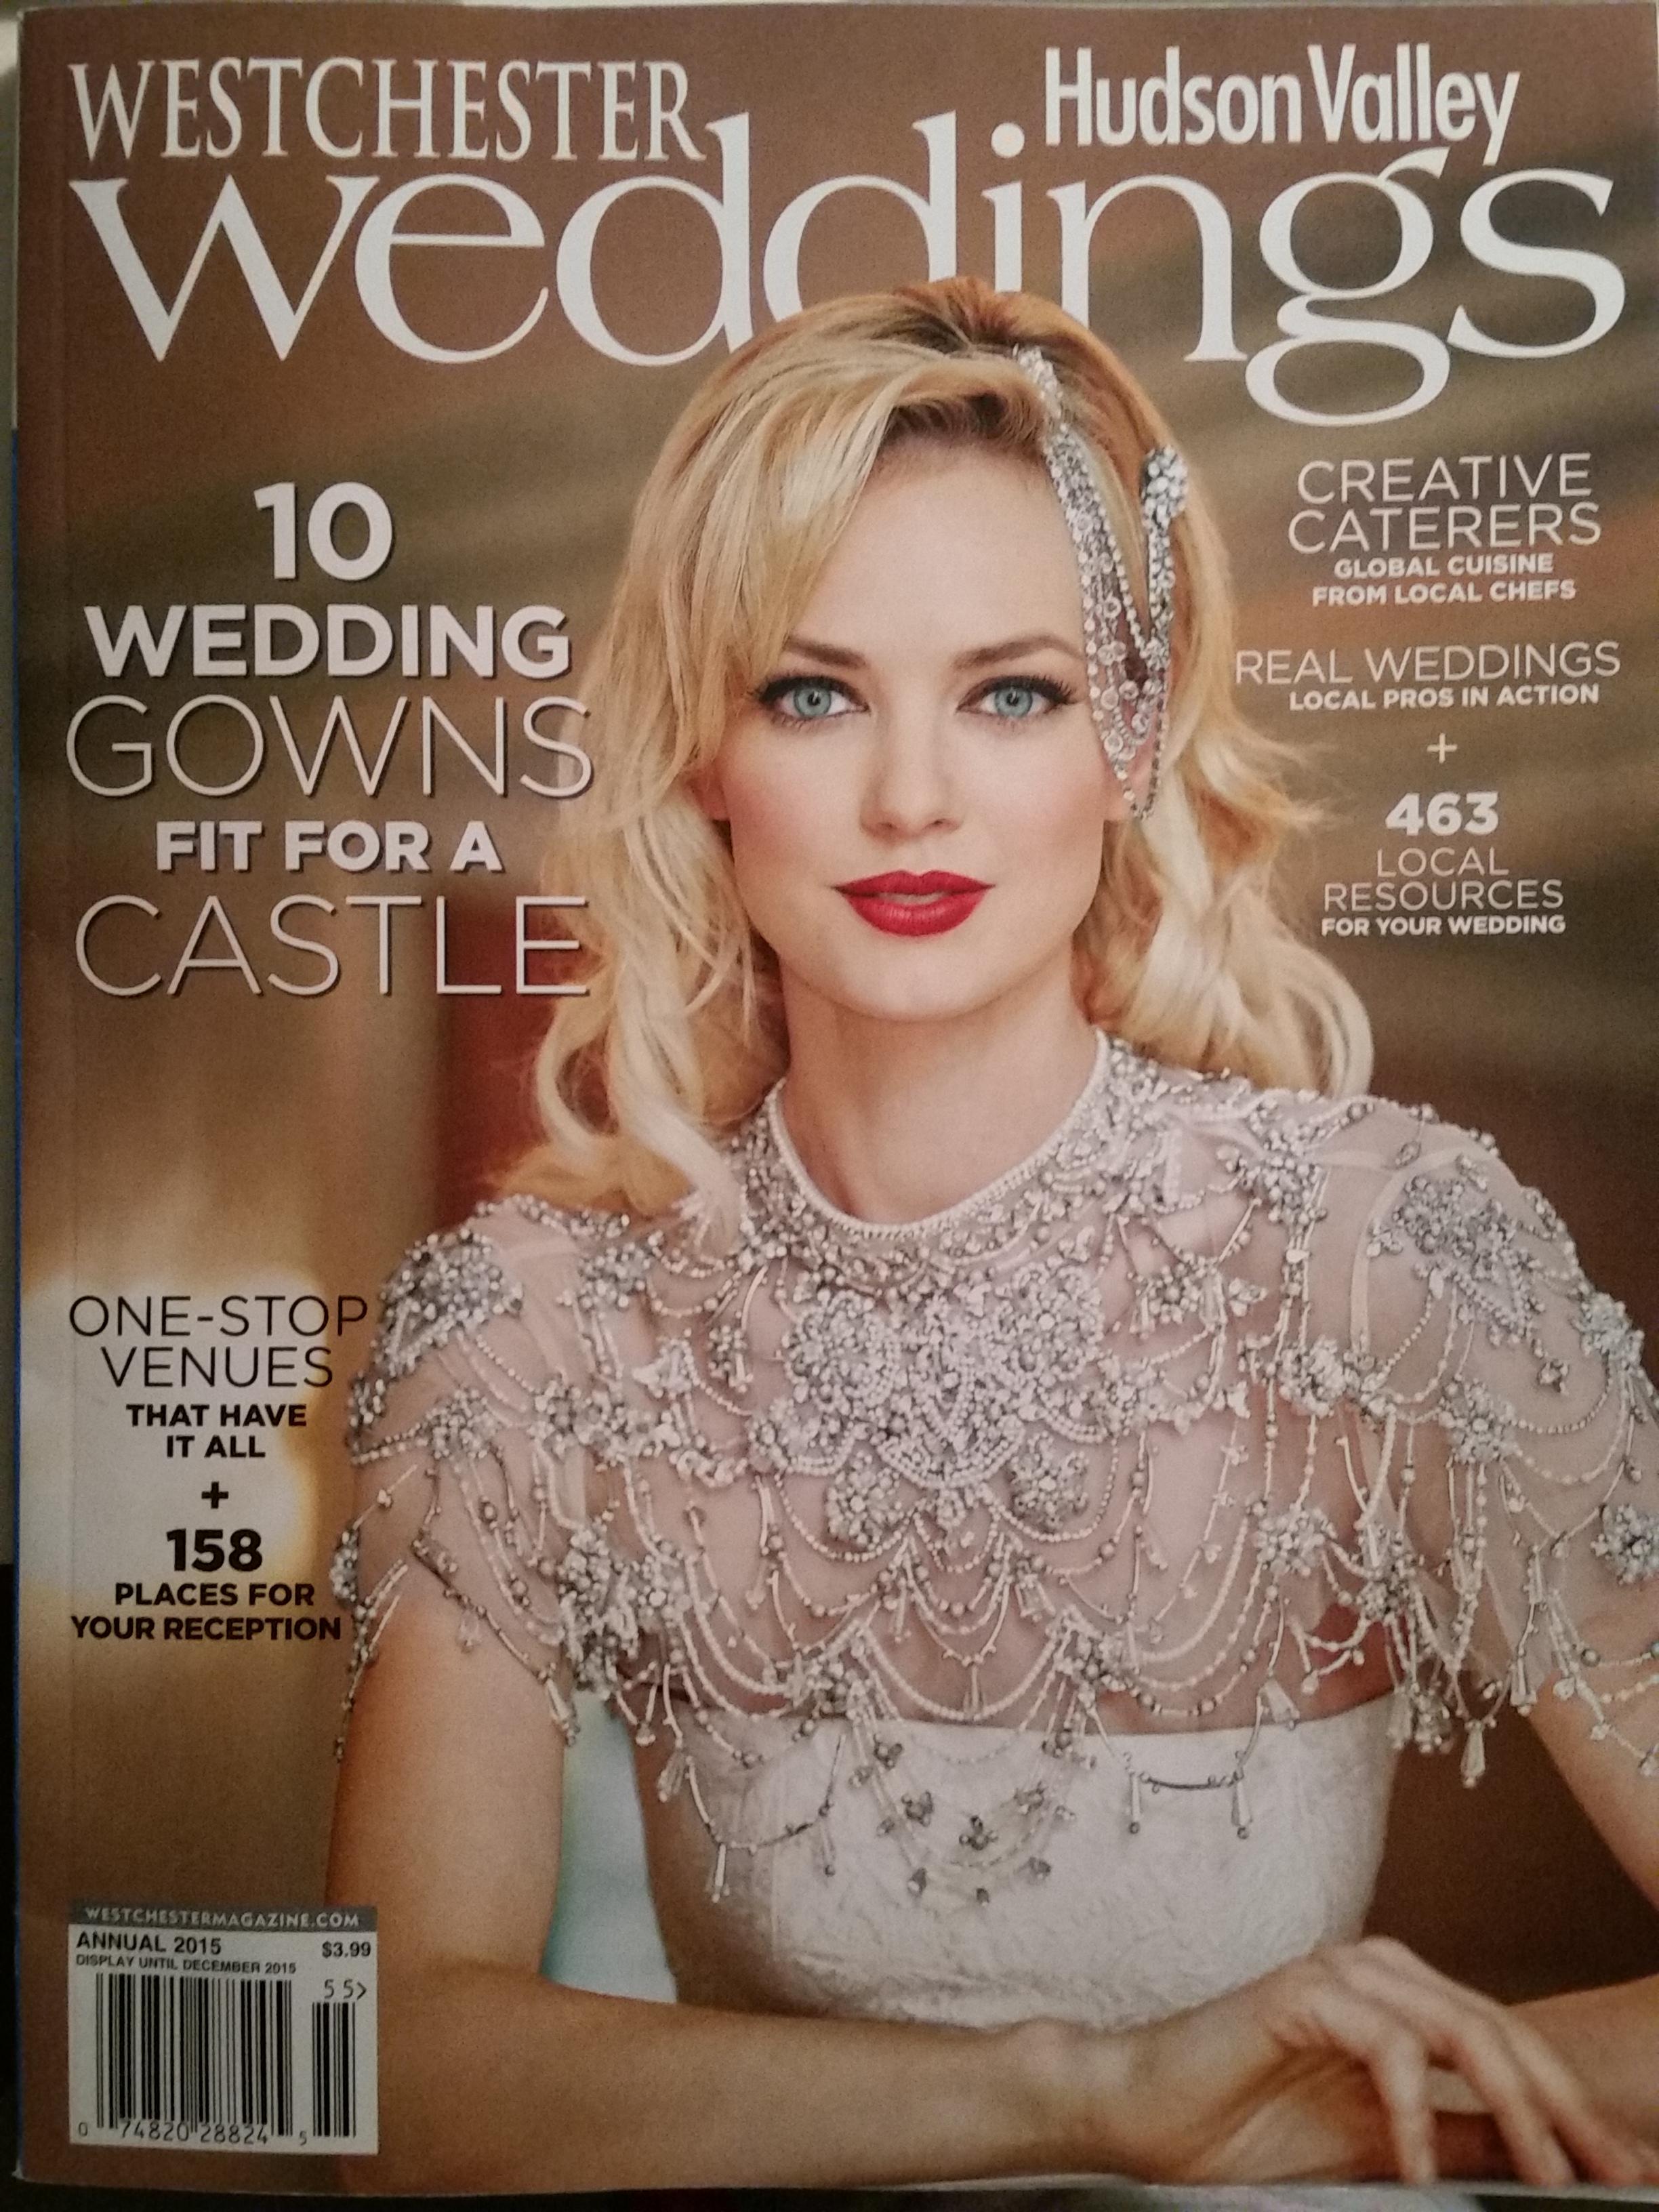 westchester wedding magazine creative caterer nisa lee events wedding magazines Nisa Lee Events Creative Caterer Westchester Wedding Magazine